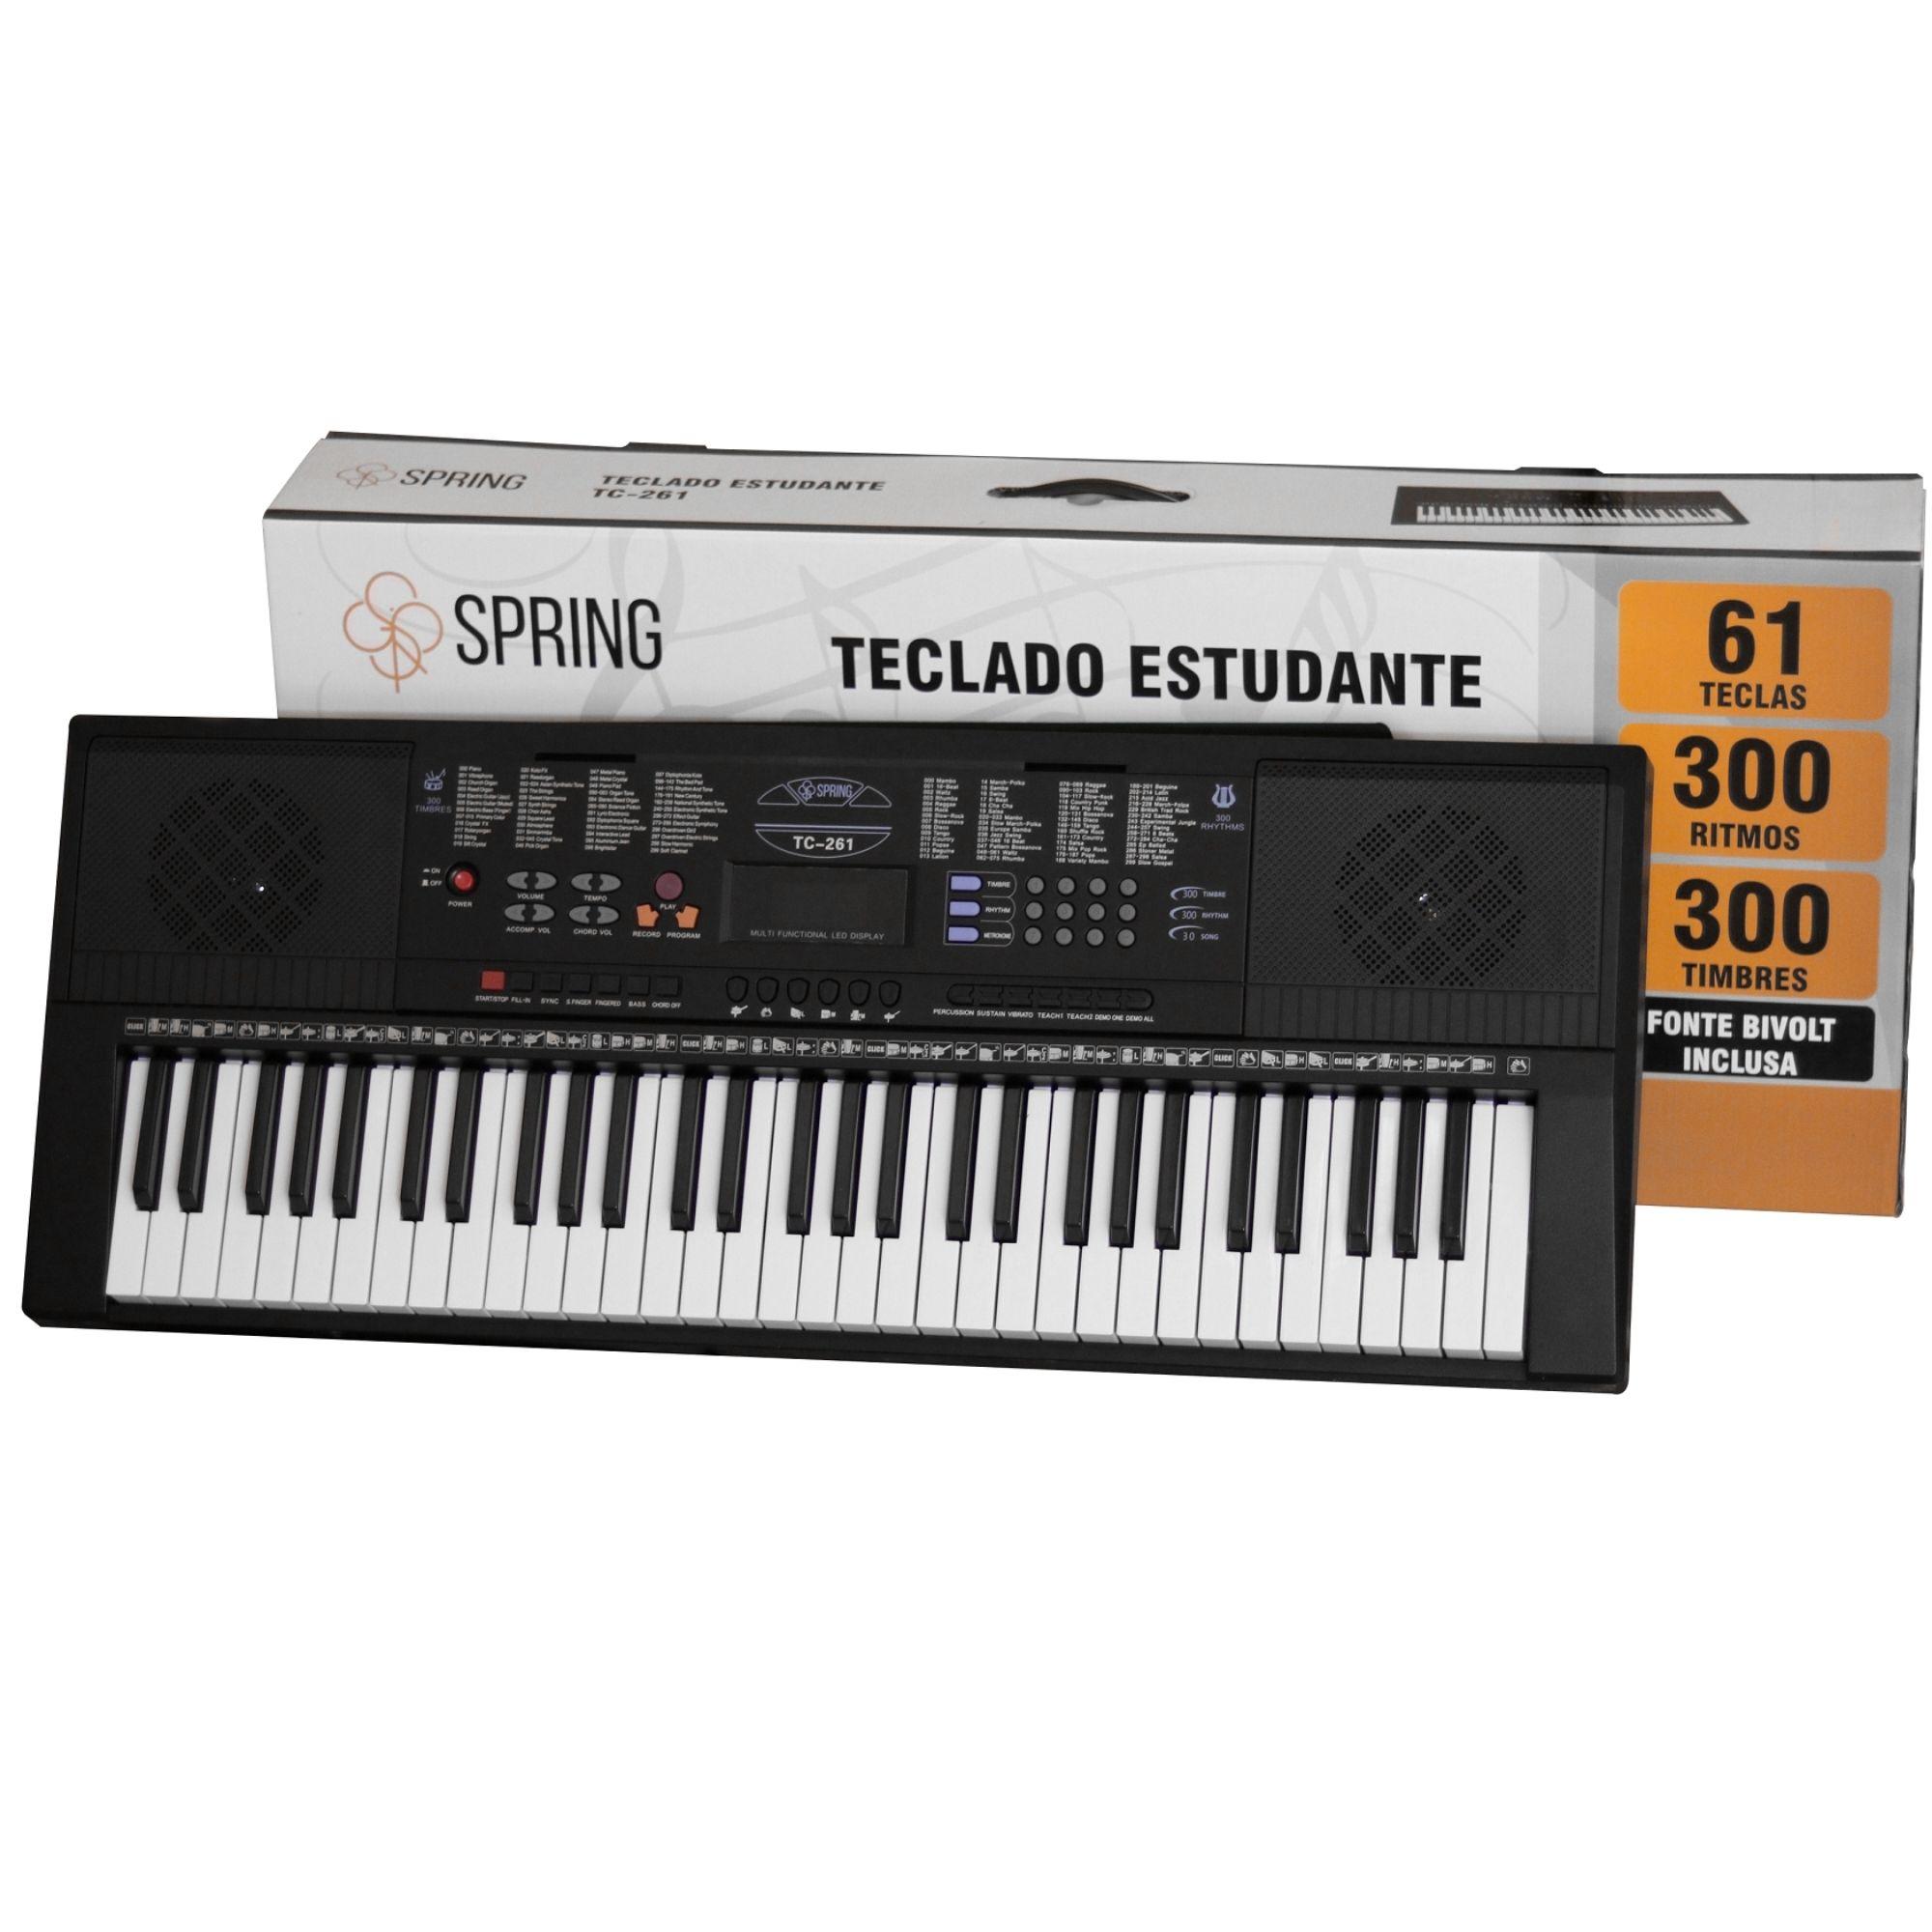 KIT TECLADO 61 TECLAS TC-261 SPRING  E SUPORTE PEDESTAL X10 IBOX